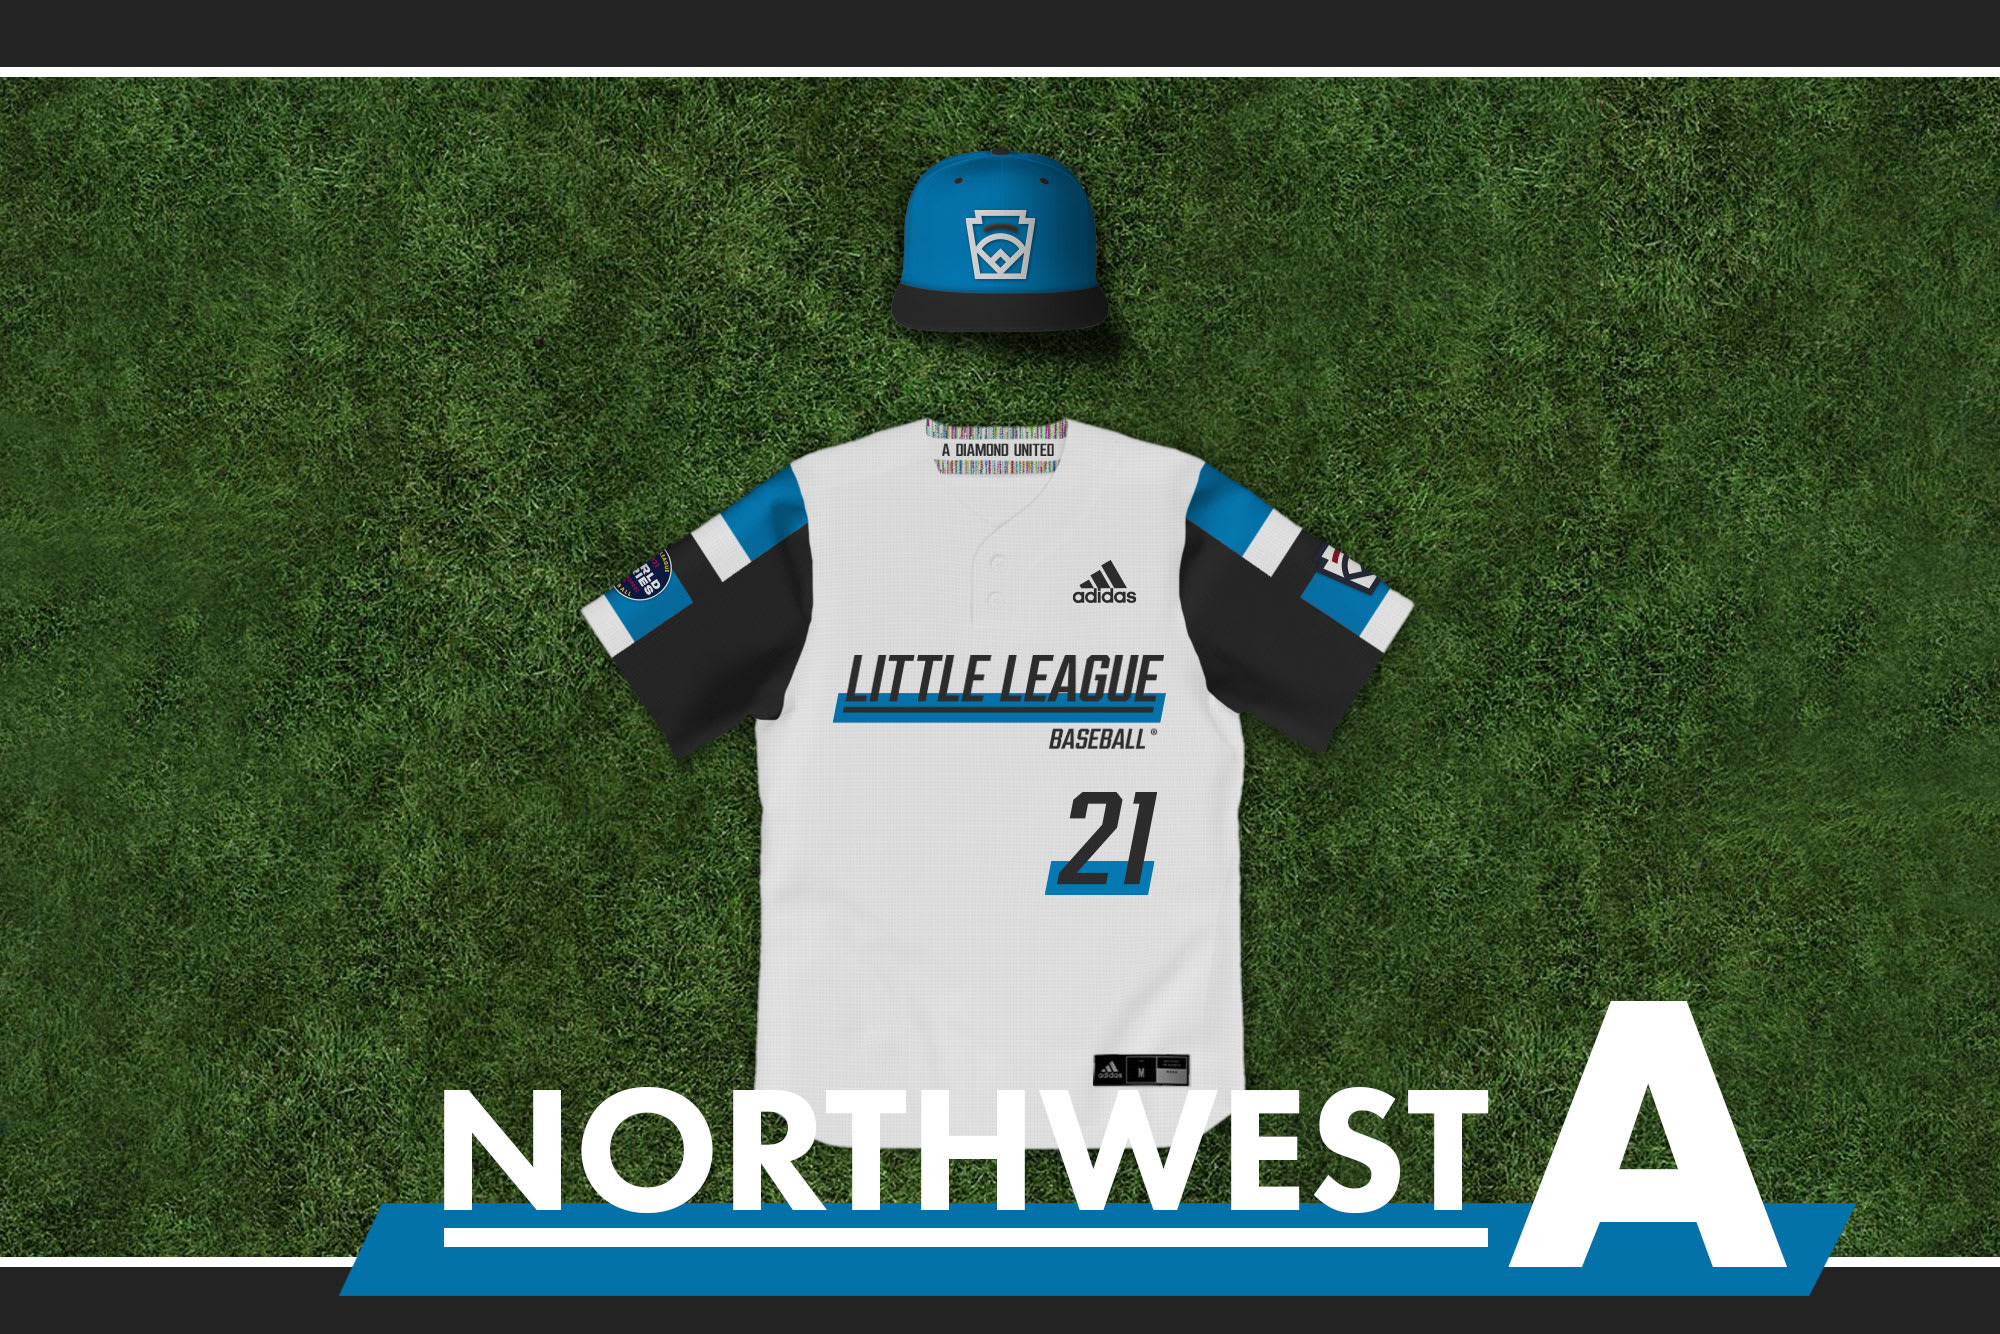 LLB Northwest A uniform